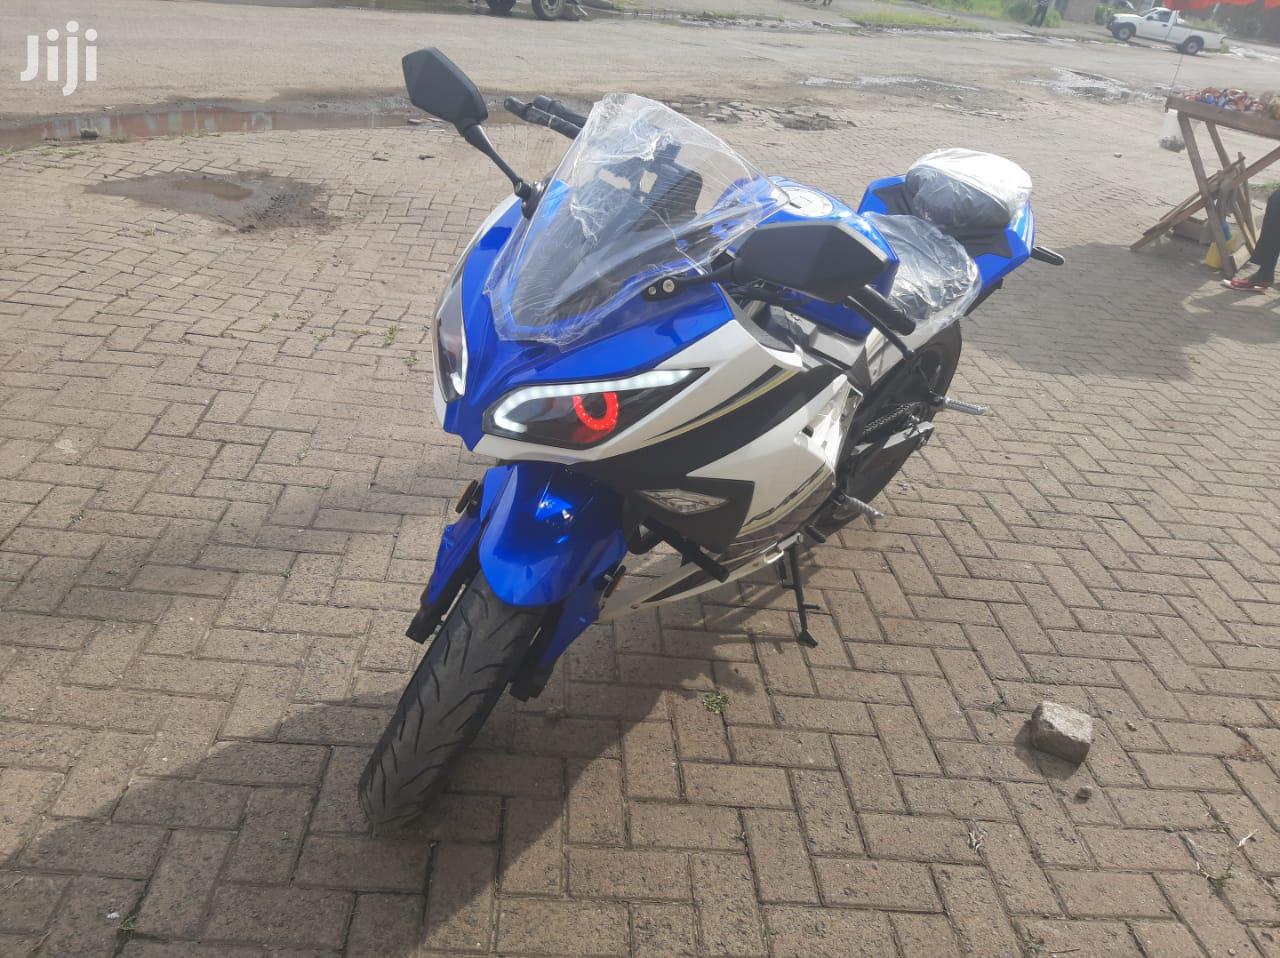 New Jincheng 2020 Blue | Motorcycles & Scooters for sale in Maringo/Hamza, Nairobi, Kenya